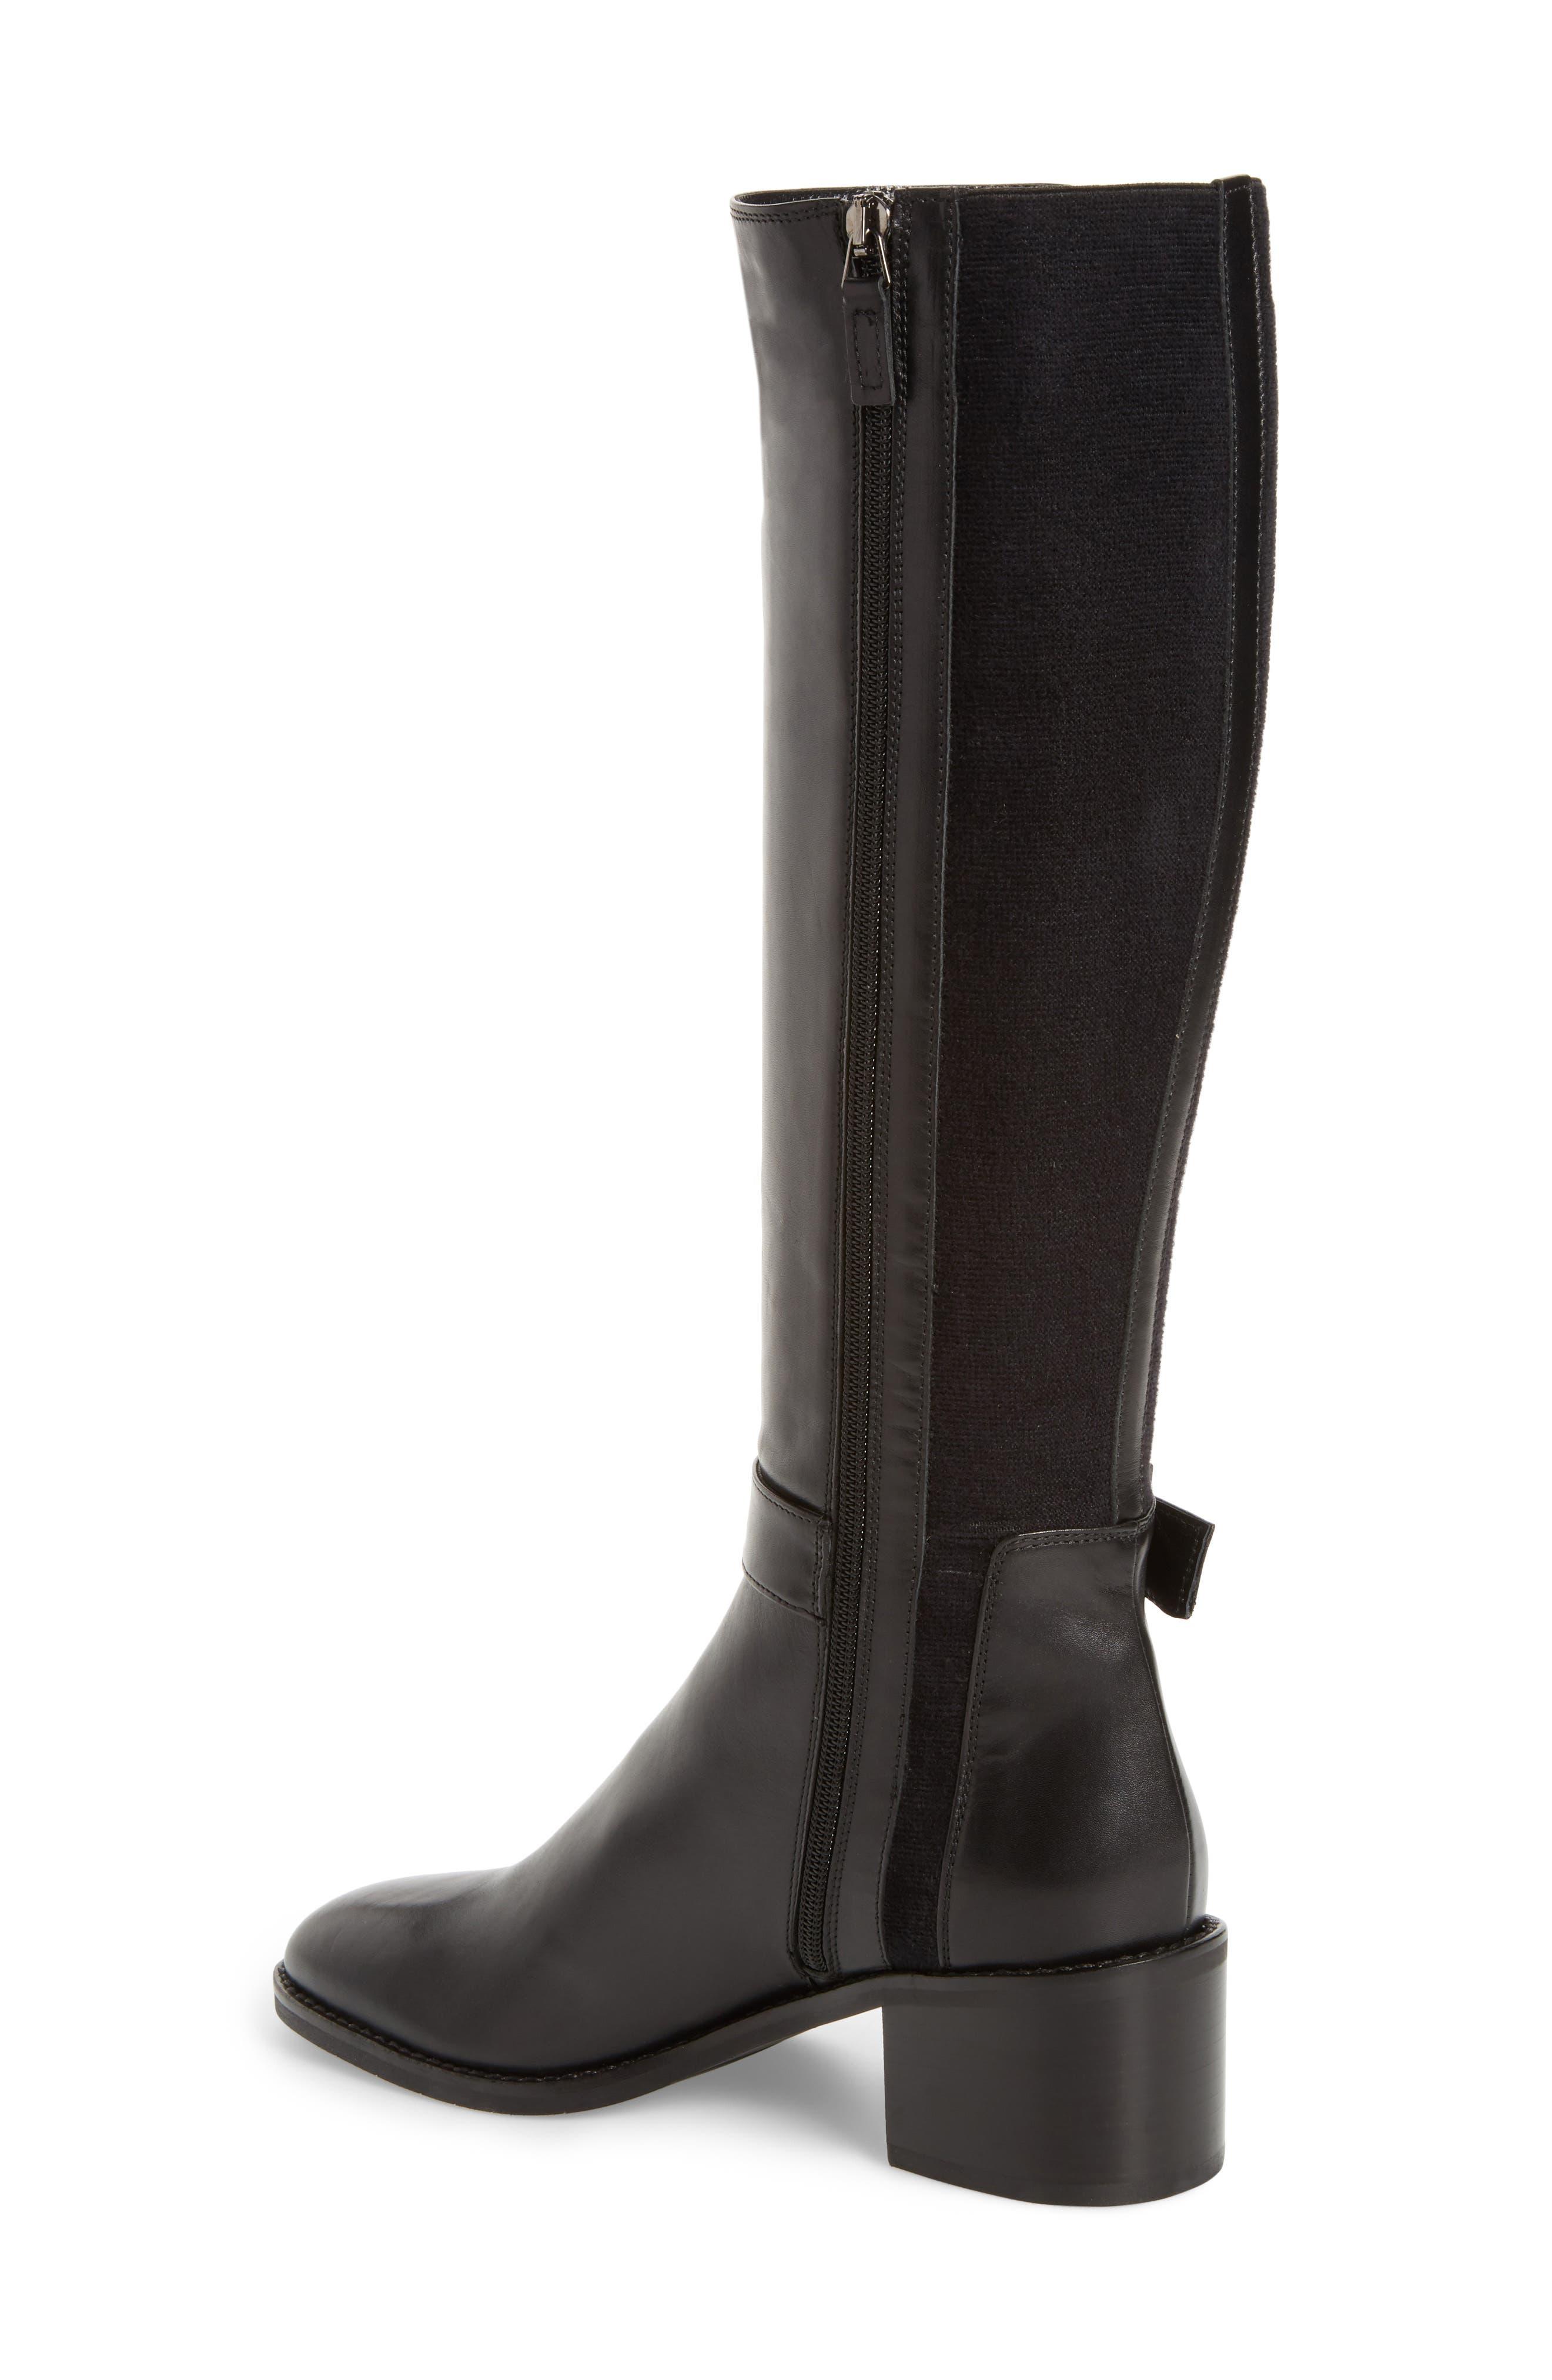 Joanna Weatherproof Tall Boot,                             Alternate thumbnail 2, color,                             001